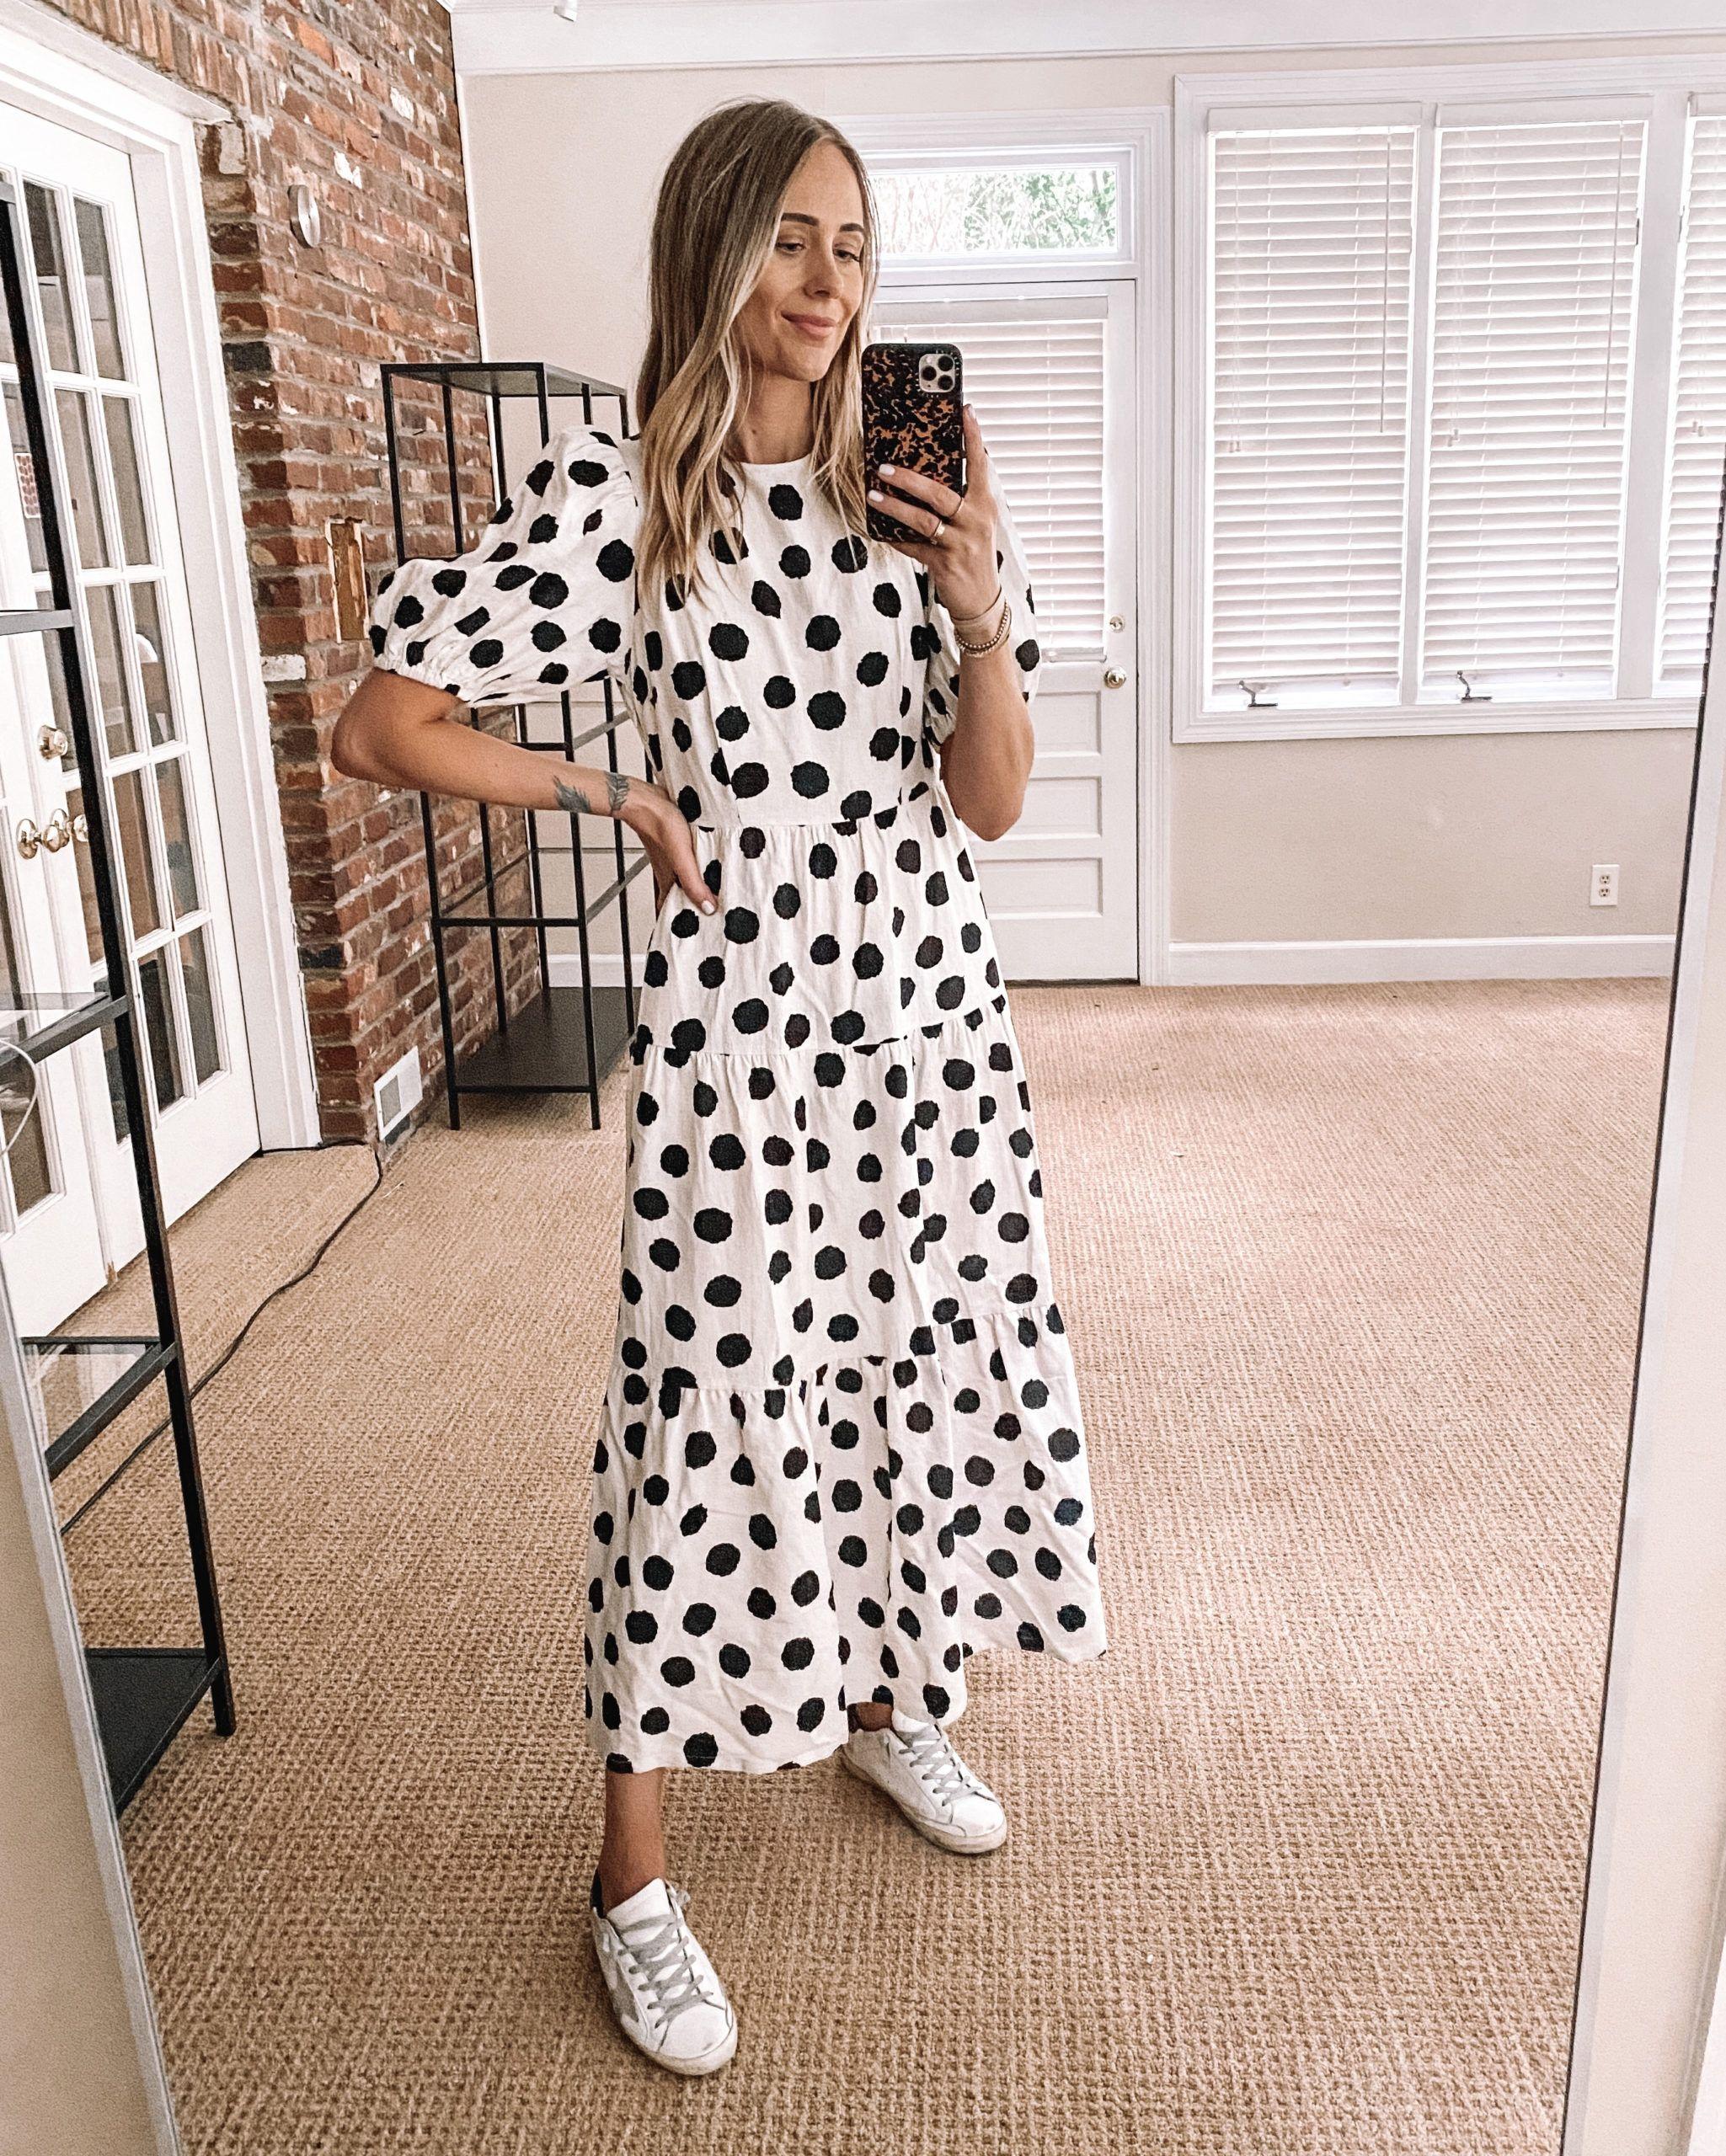 Fashion Jackson Target Finds Who What Wear Black White Polka Dot Maxi Dress Fashion Jackson Polka Dot Dress Outfit Summer Dress Outfits [ 2560 x 2049 Pixel ]